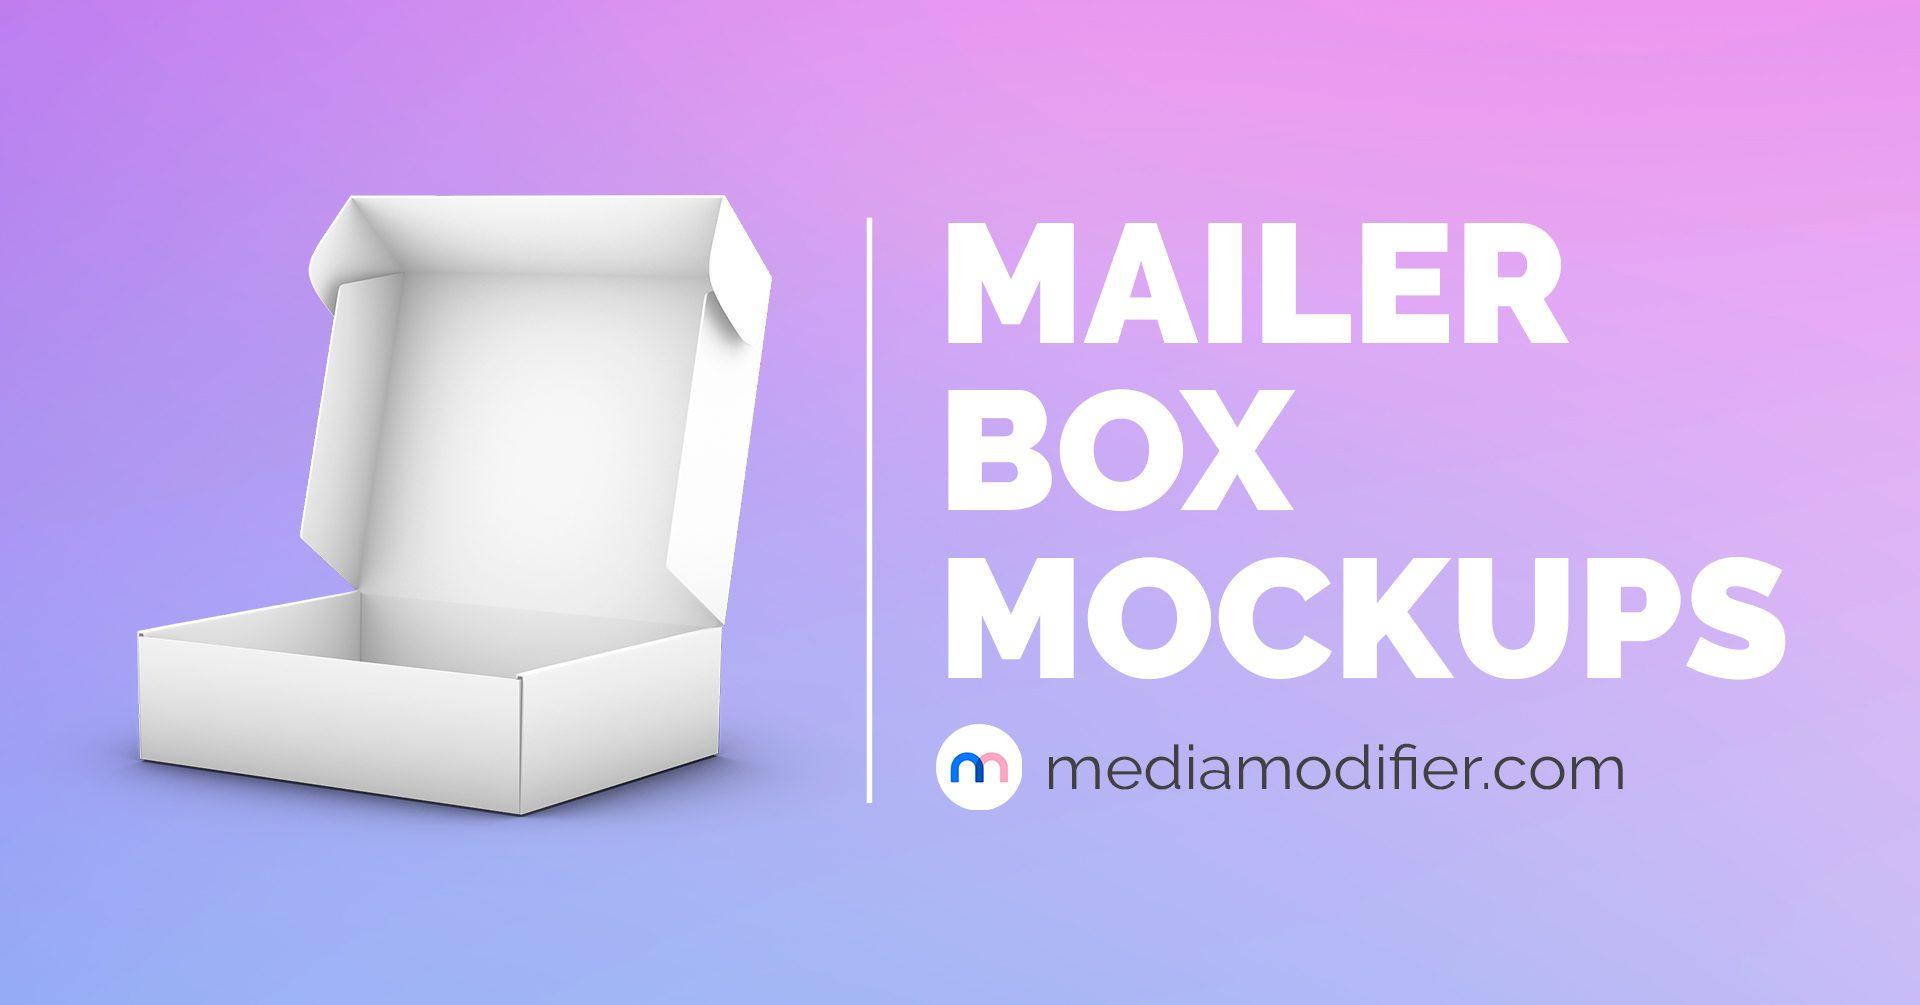 21 Best Mailer Box Mockups  Mediamodifier In Card Box Template Generator